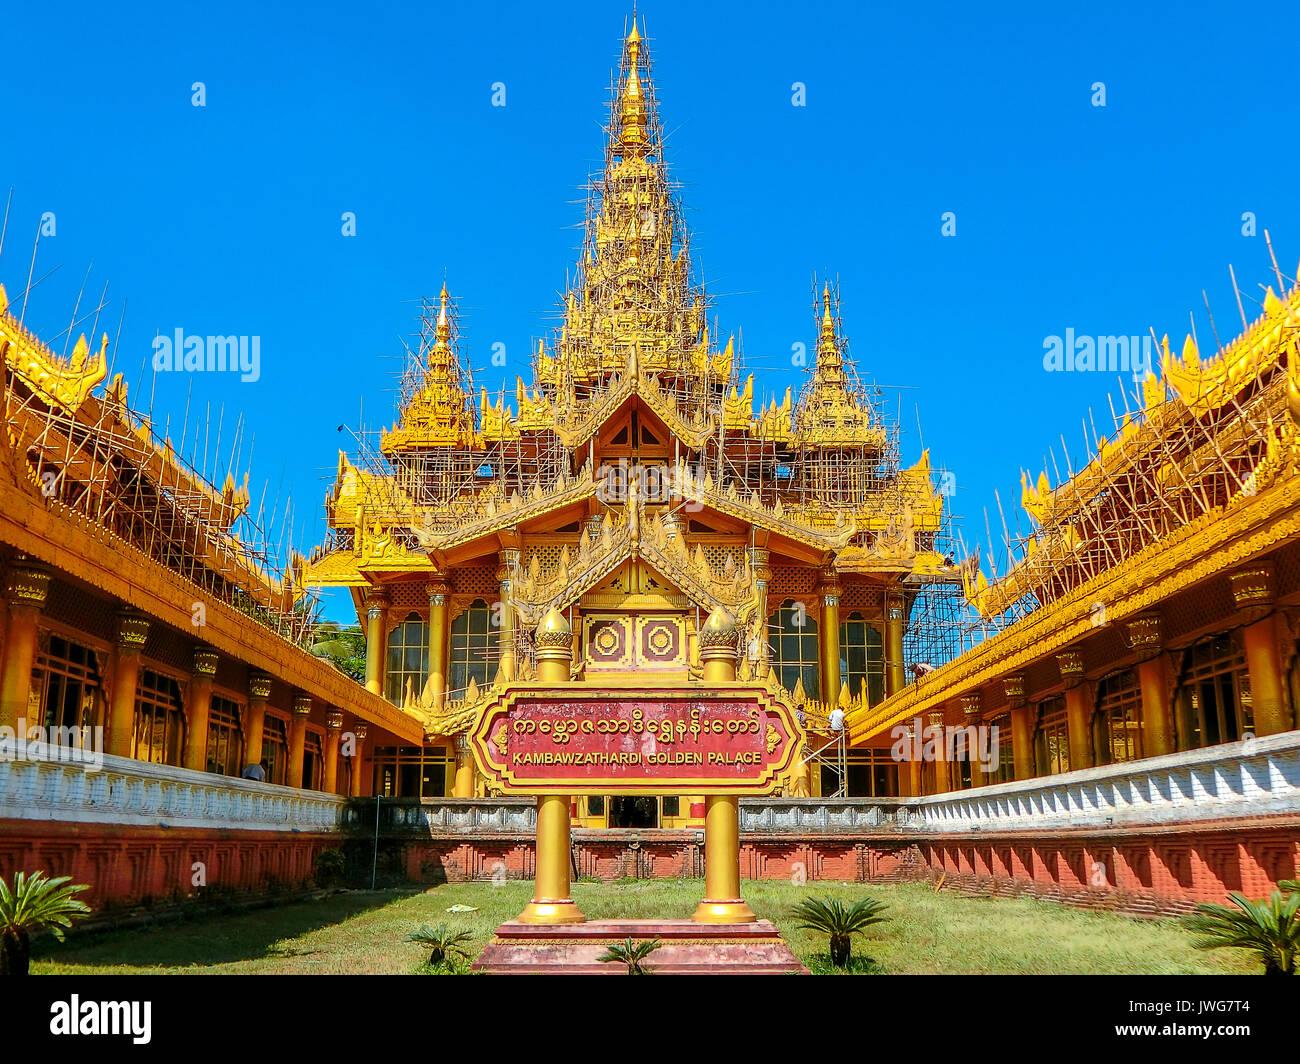 Kamboza thadi palace en Myanmar. Foto de stock